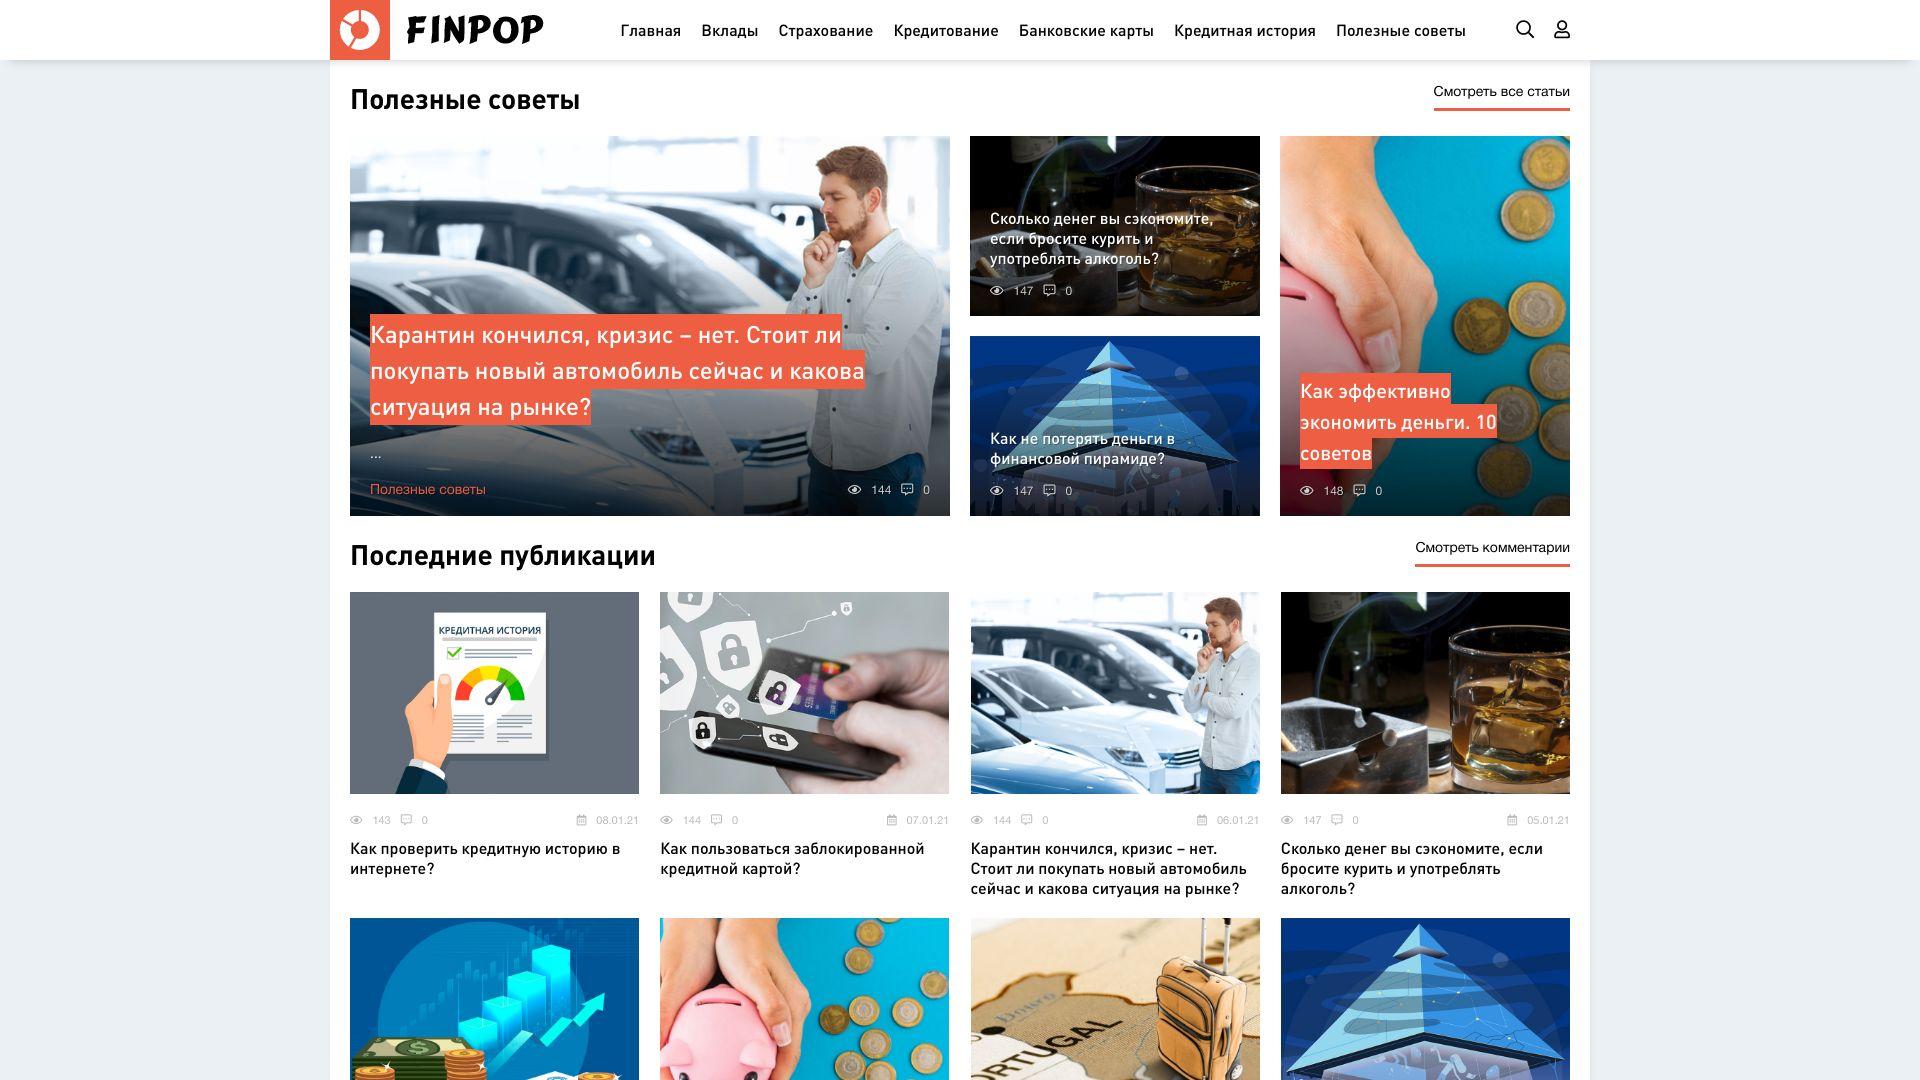 finpop.ru